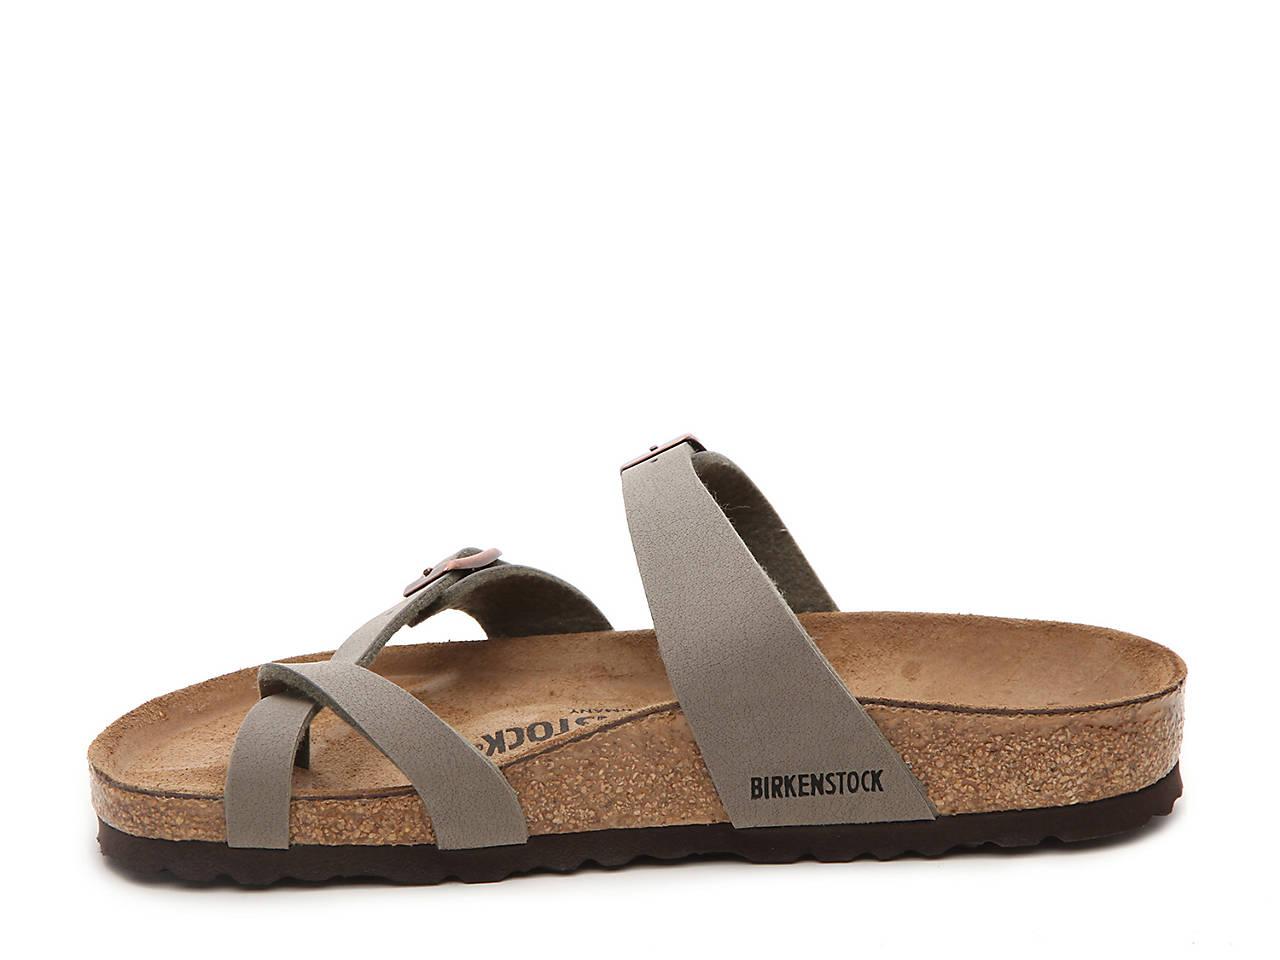 099720b46515 Birkenstock Mayari Sandal - Women s Women s Shoes